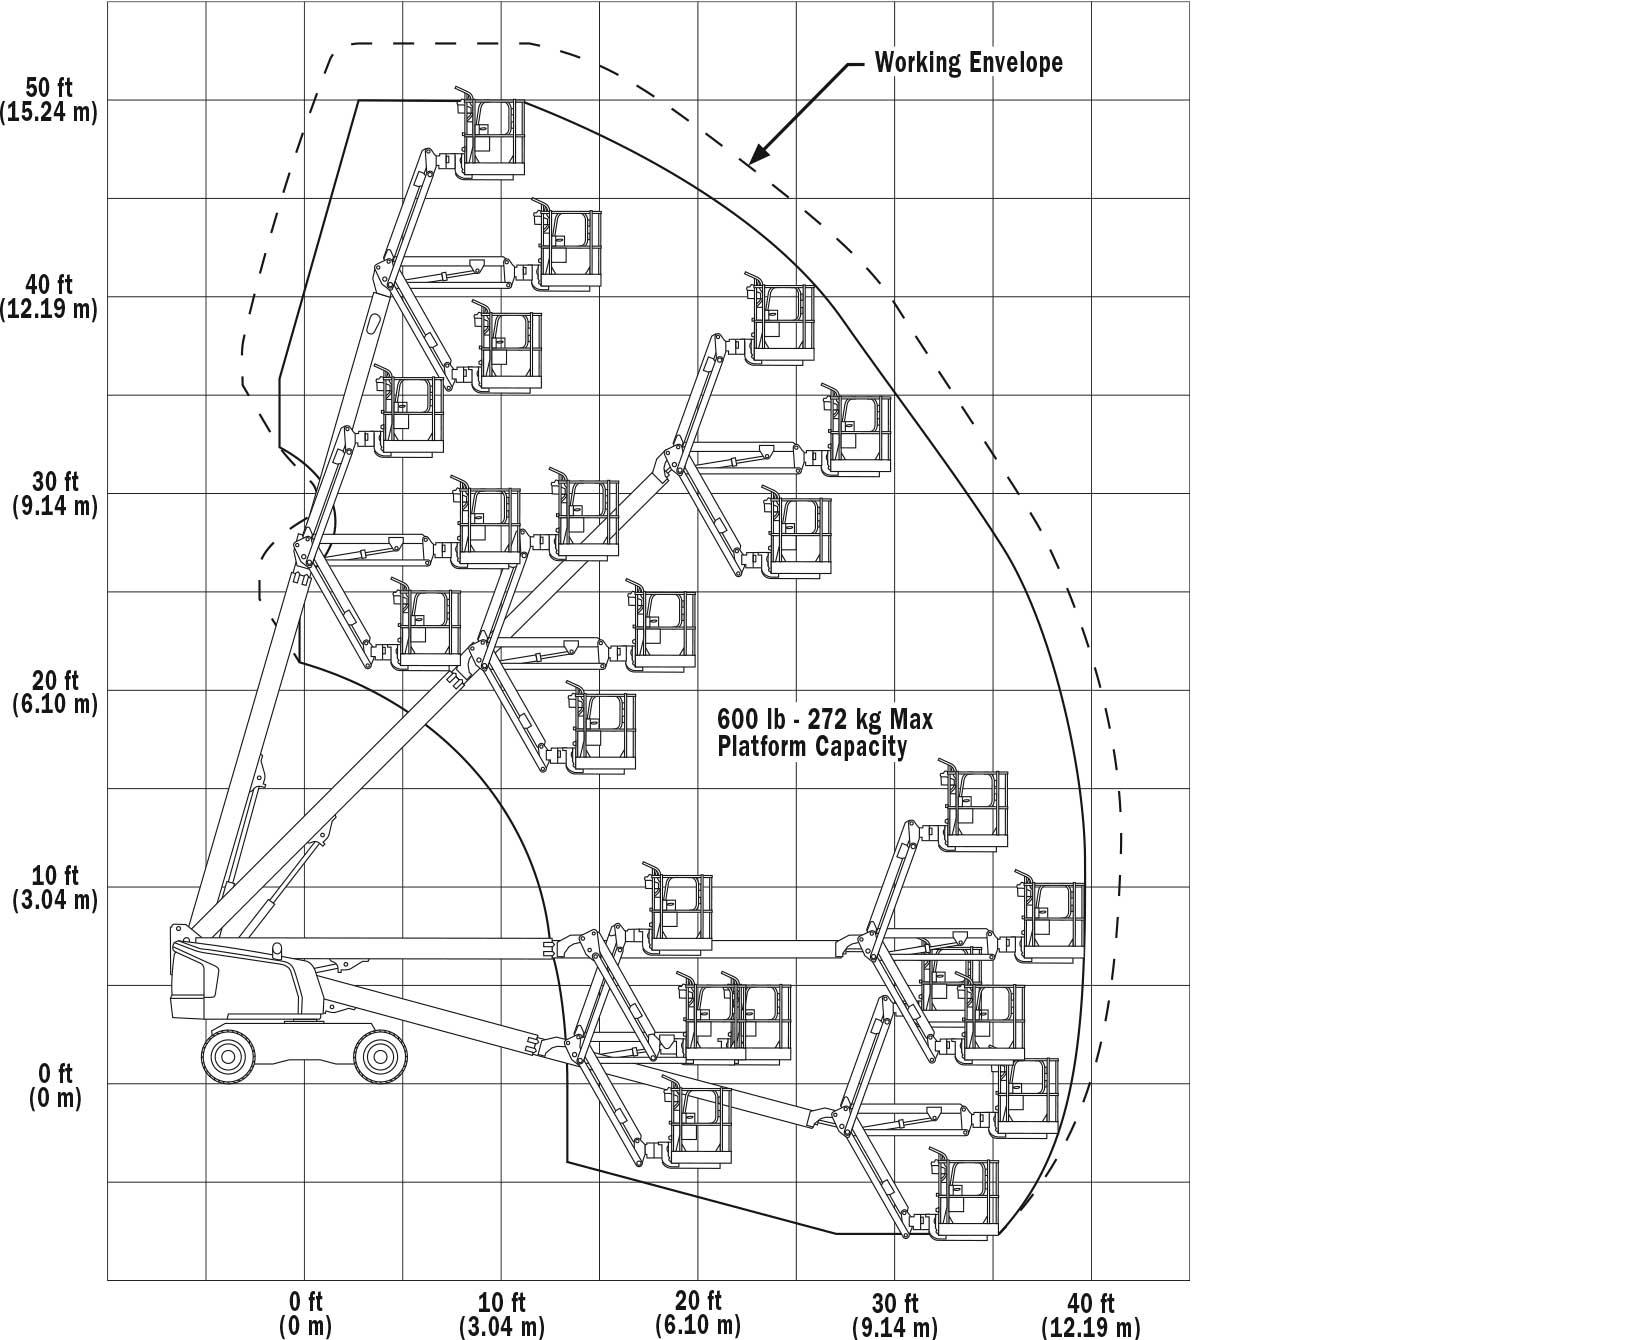 400s Telescopic Boom Lift Jlg Skytrak 8042 Troubleshooting Skytrak 6036 Wiring Diagram Skytrak 5028 Service Manual